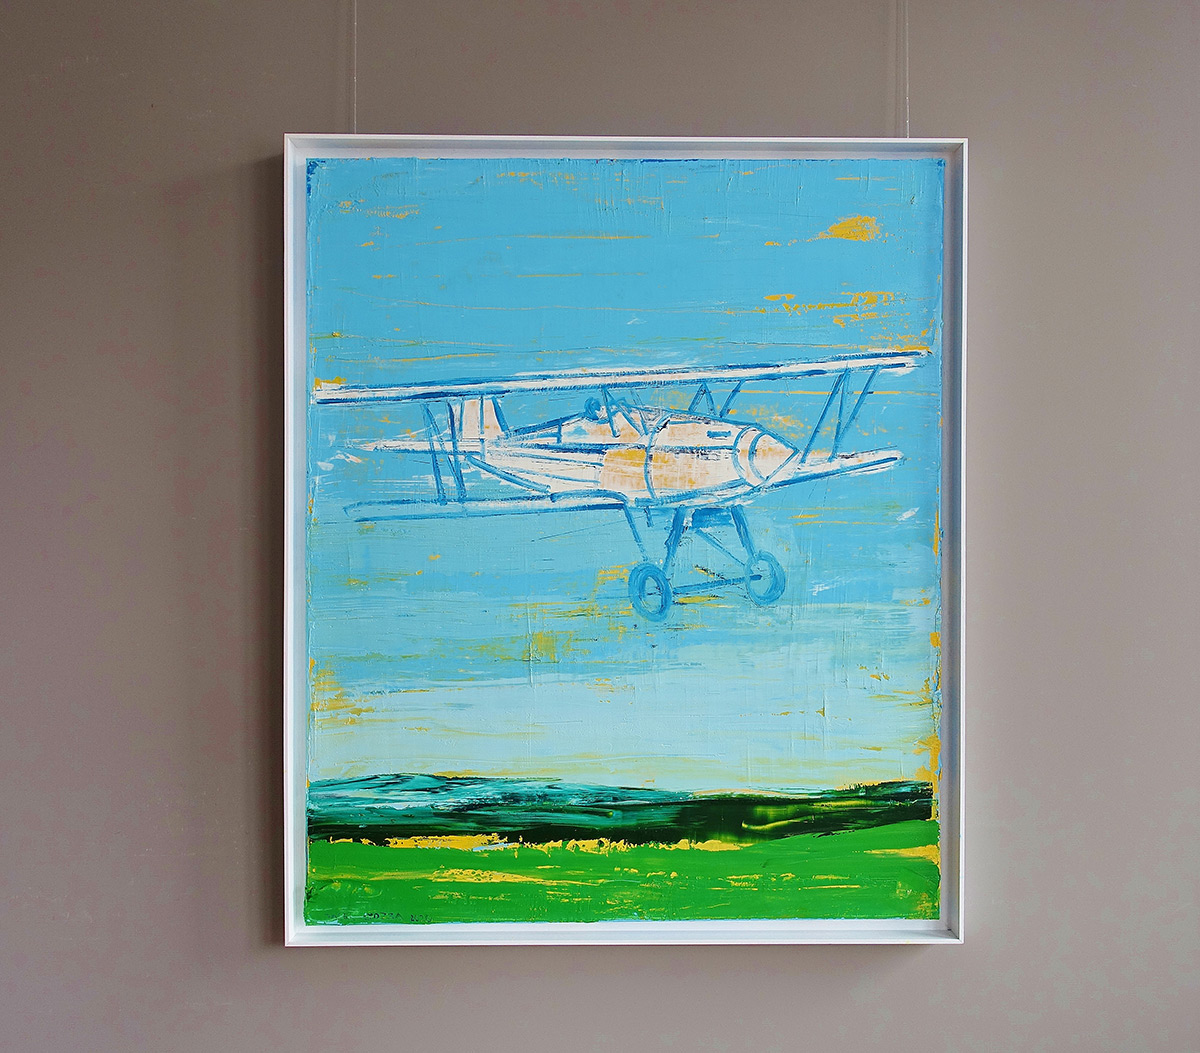 Jacek Łydżba : White plane